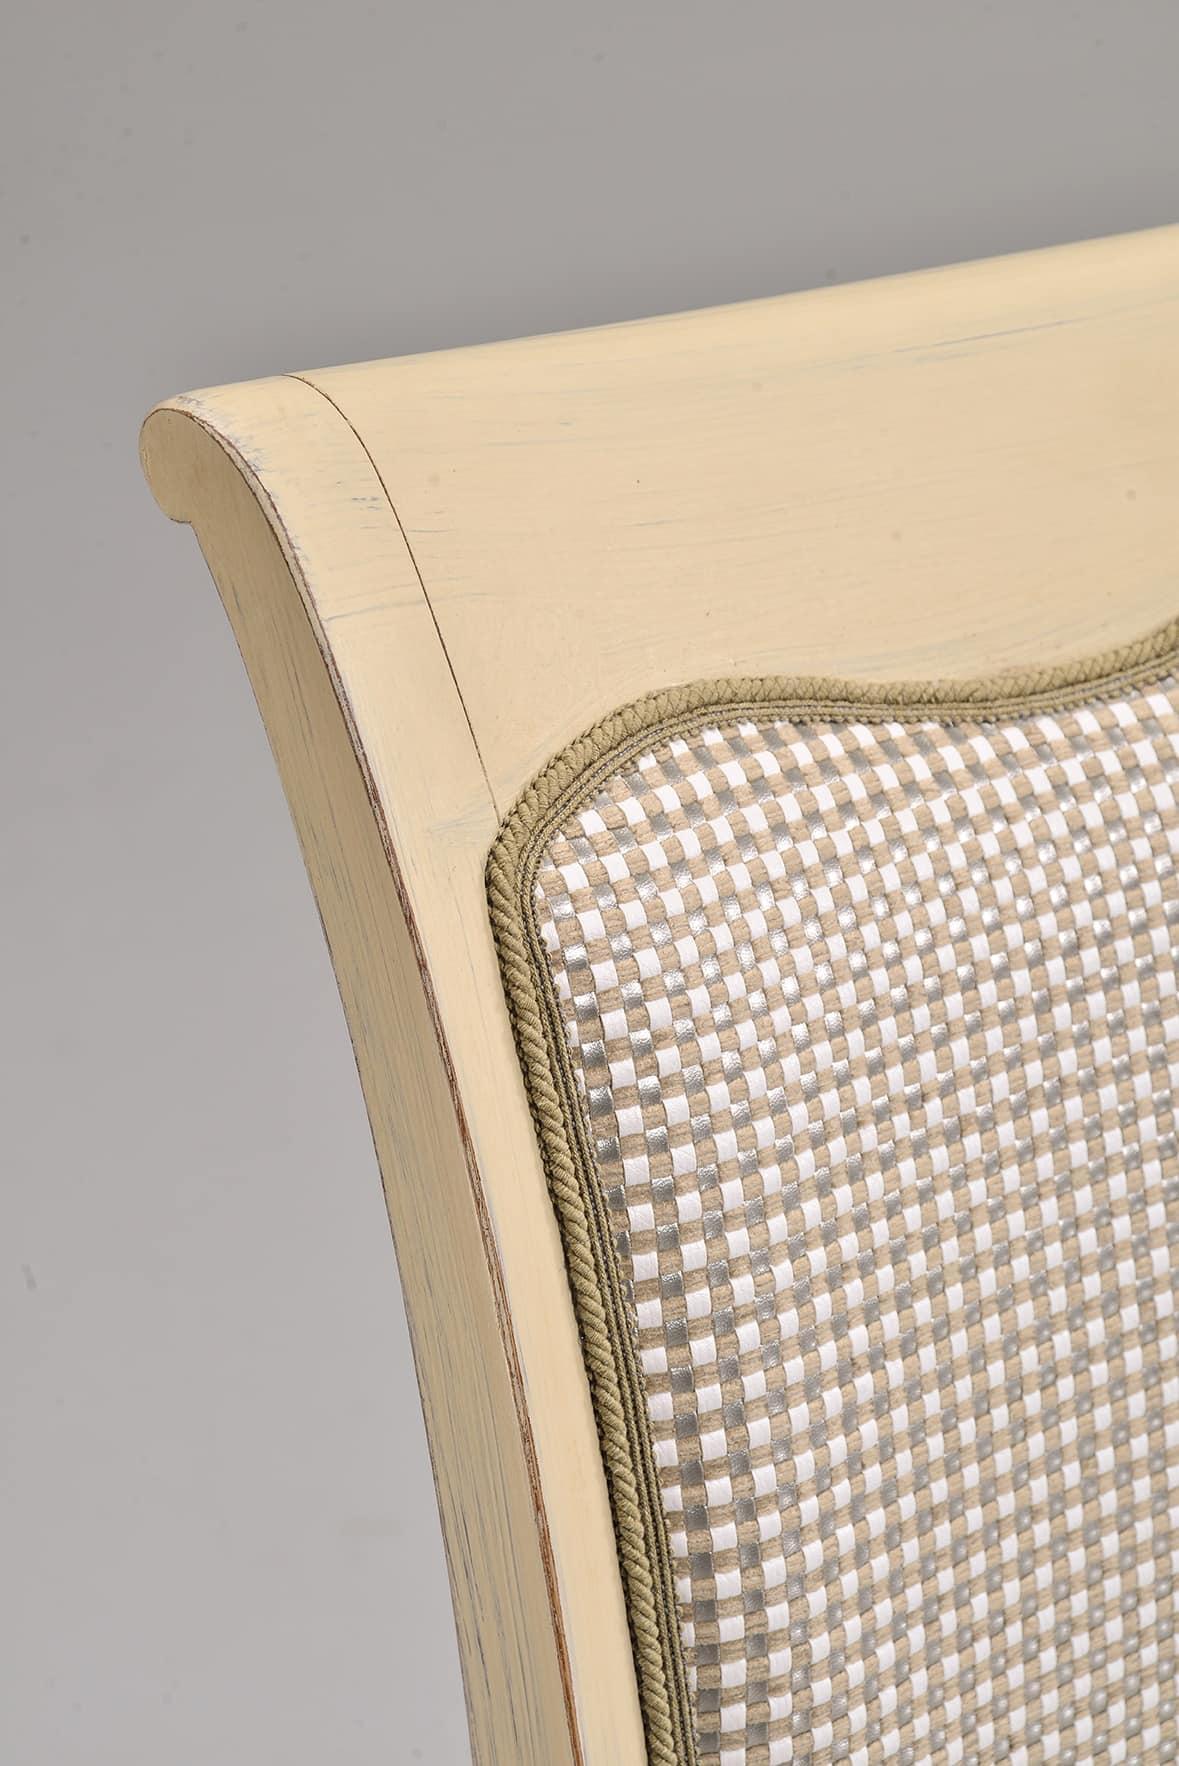 MILUNA sedia 8314S, Sedia per soggiorni in stile classico, imbottita